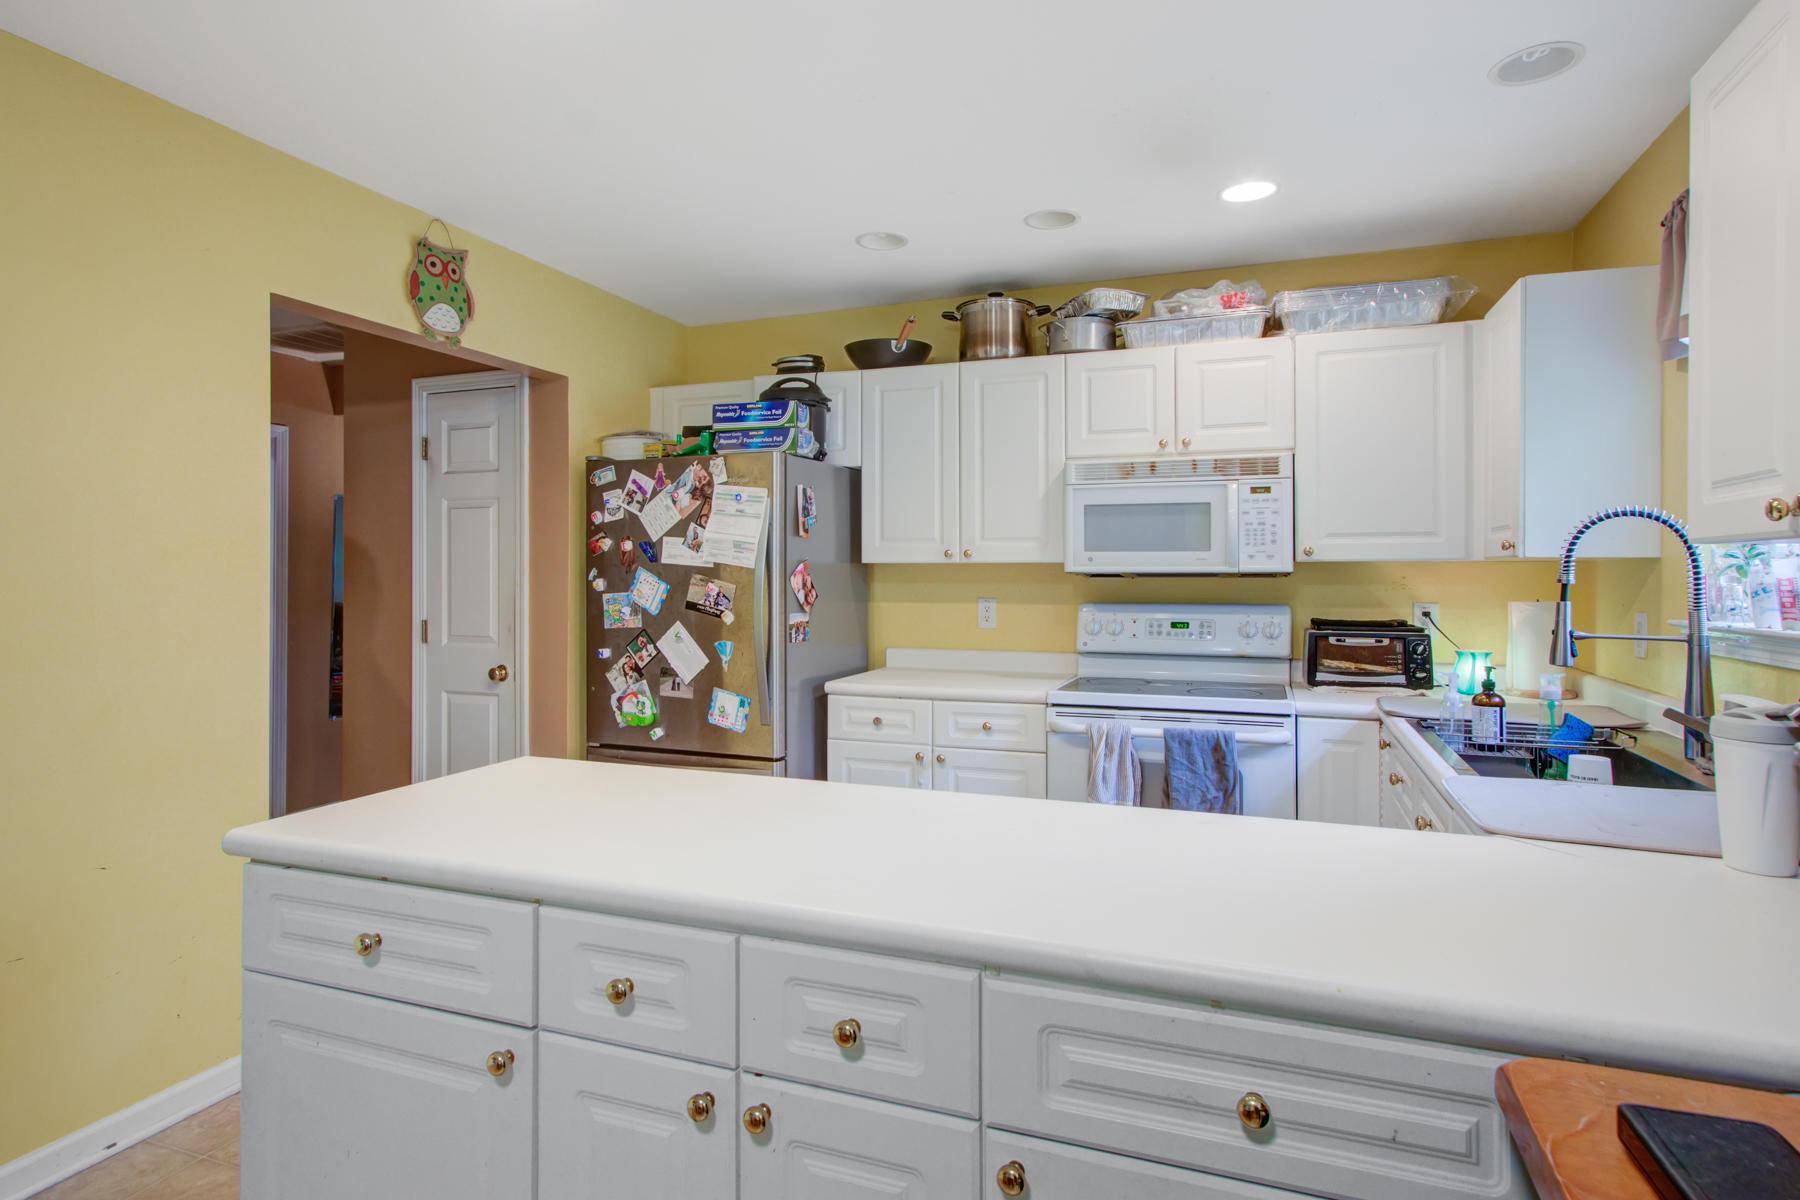 Dunes West Homes For Sale - 2232 Kings Gate, Mount Pleasant, SC - 27